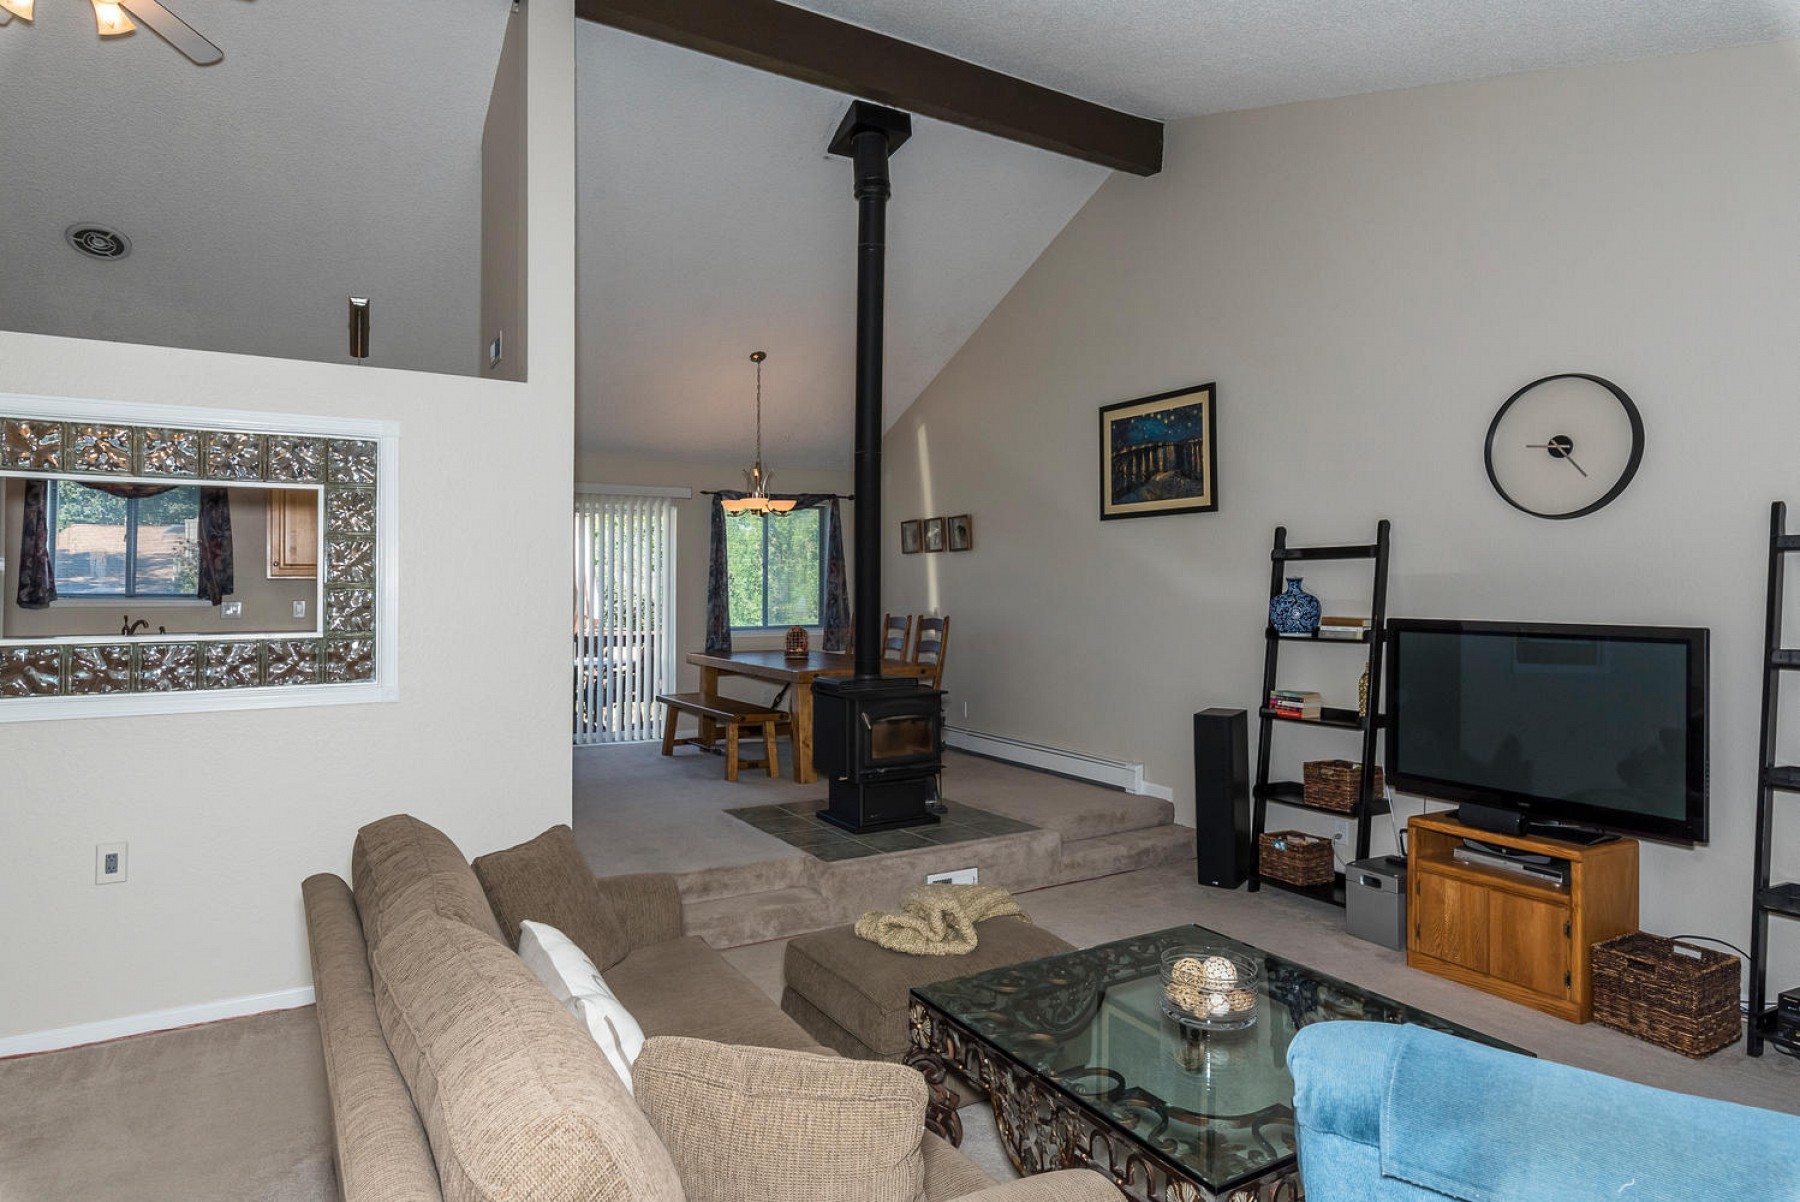 2856 W. Bryant Place, Littleton, CO 80120